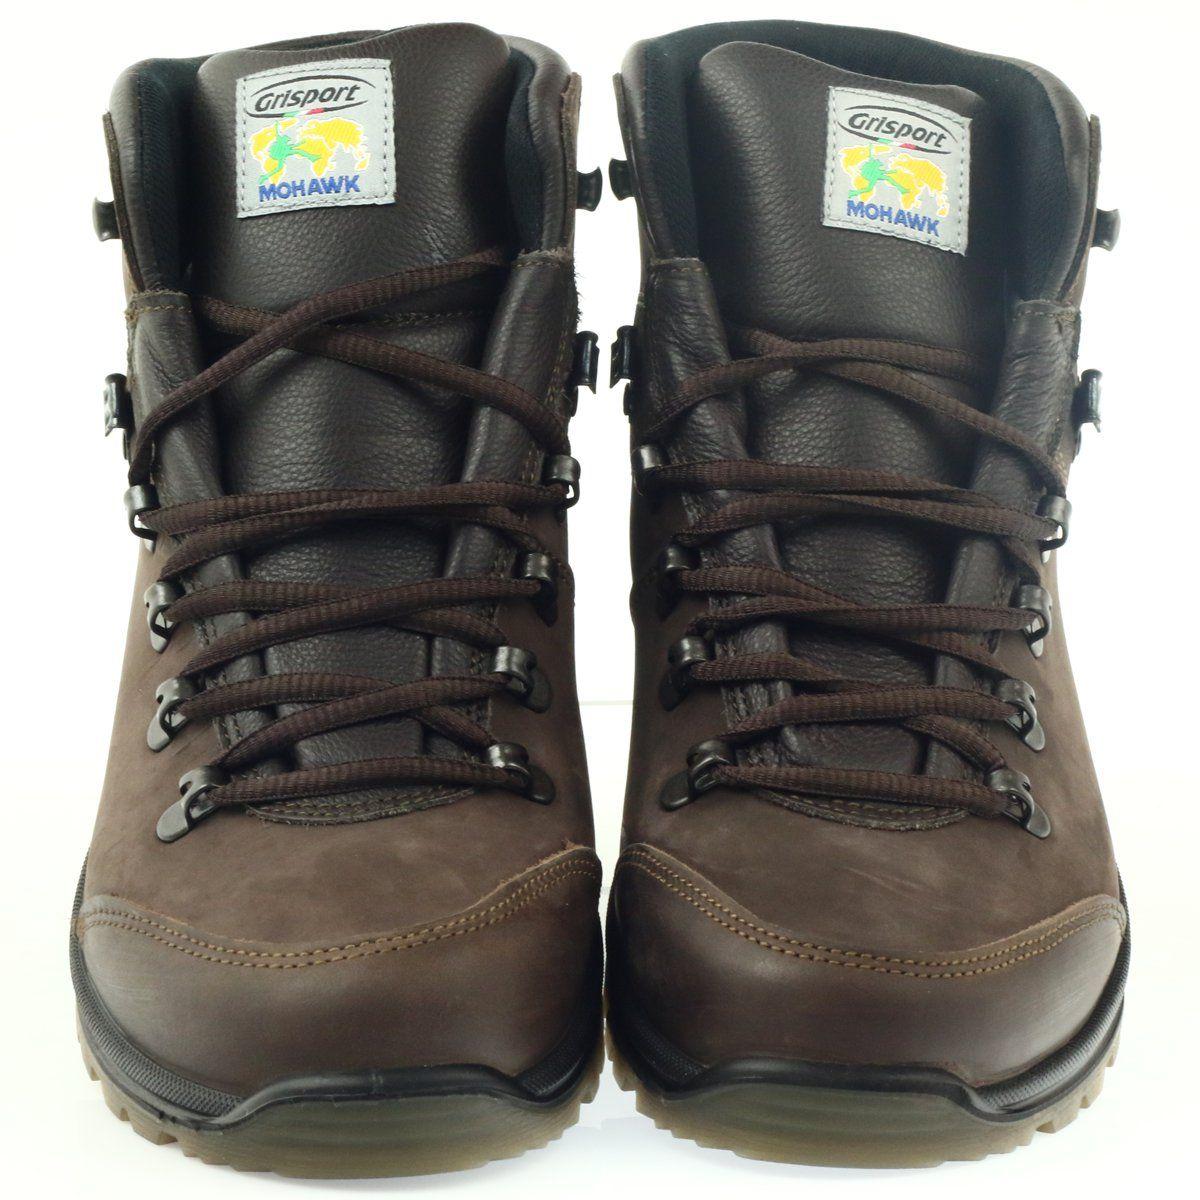 Grisport Brazowe Buty Trekkingowe Hiking Boots Shoes Boots